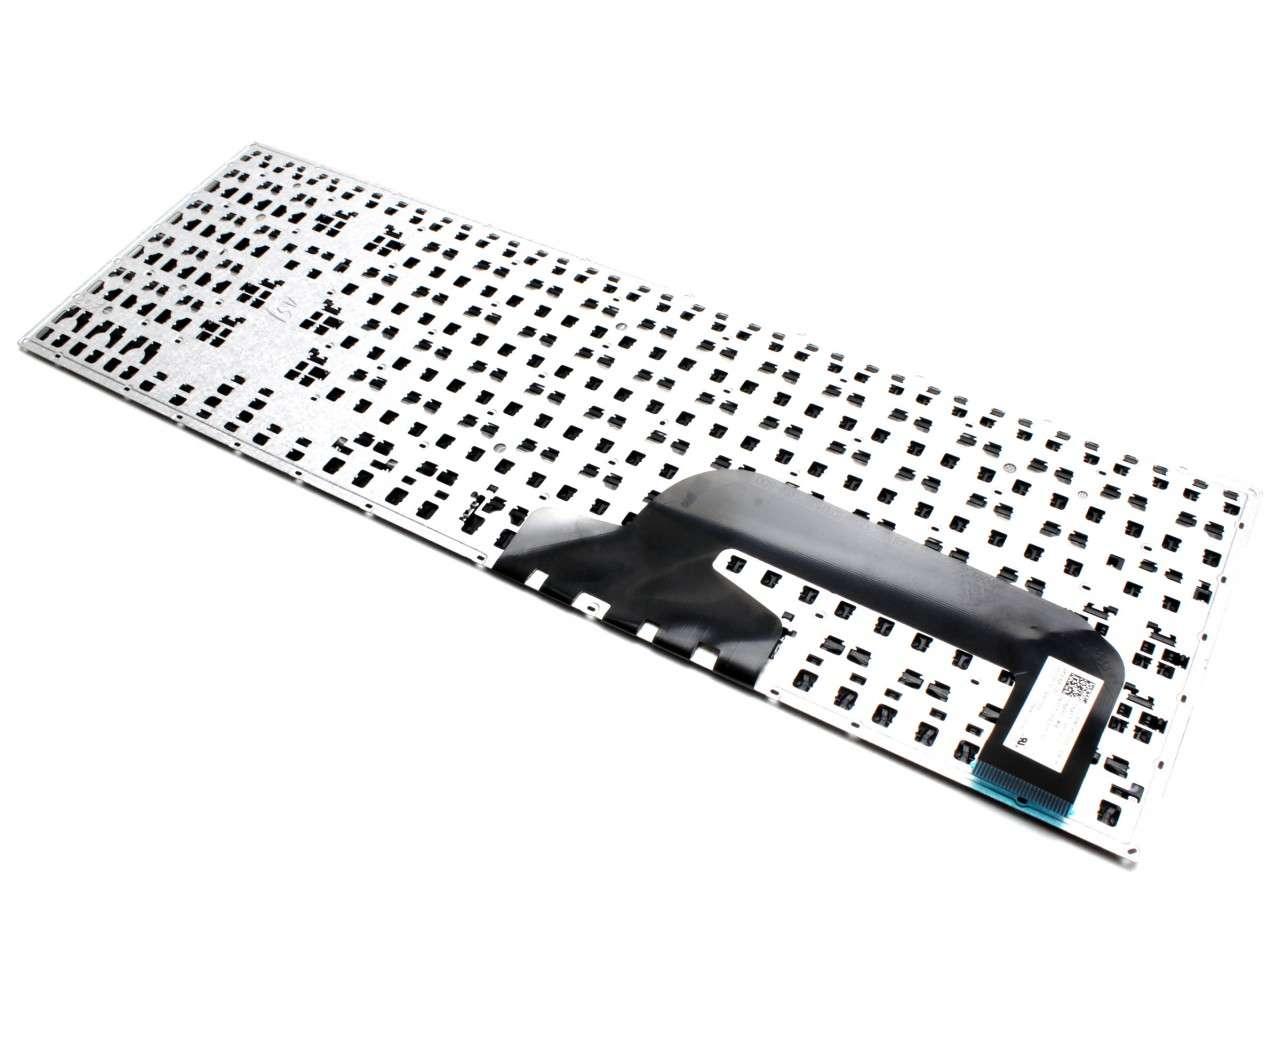 Tastatura Asus 0KN1-3XUS12 layout US fara rama enter mic imagine